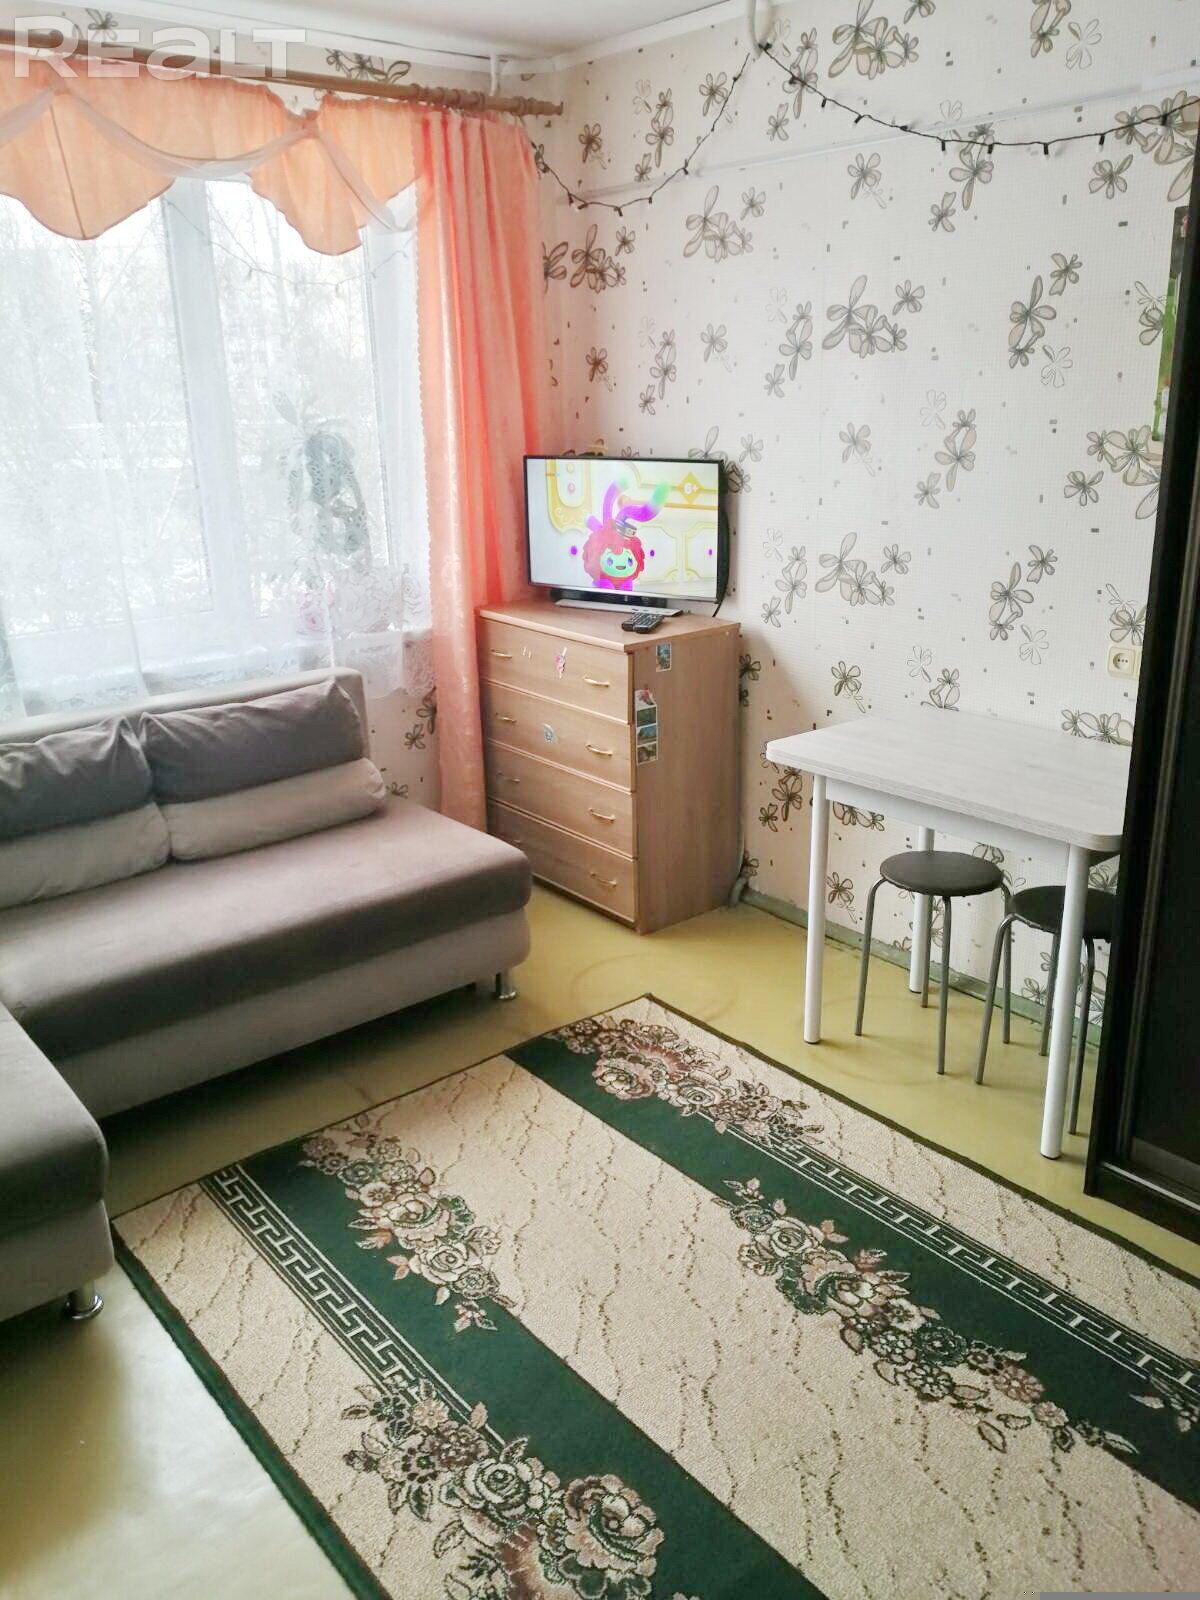 Продажа комнаты в 3-комнатной квартире в г. Минске, ул. Шишкина, дом 26 (р-н Р-н ДК МАЗ). Цена 39 101 руб c торгом